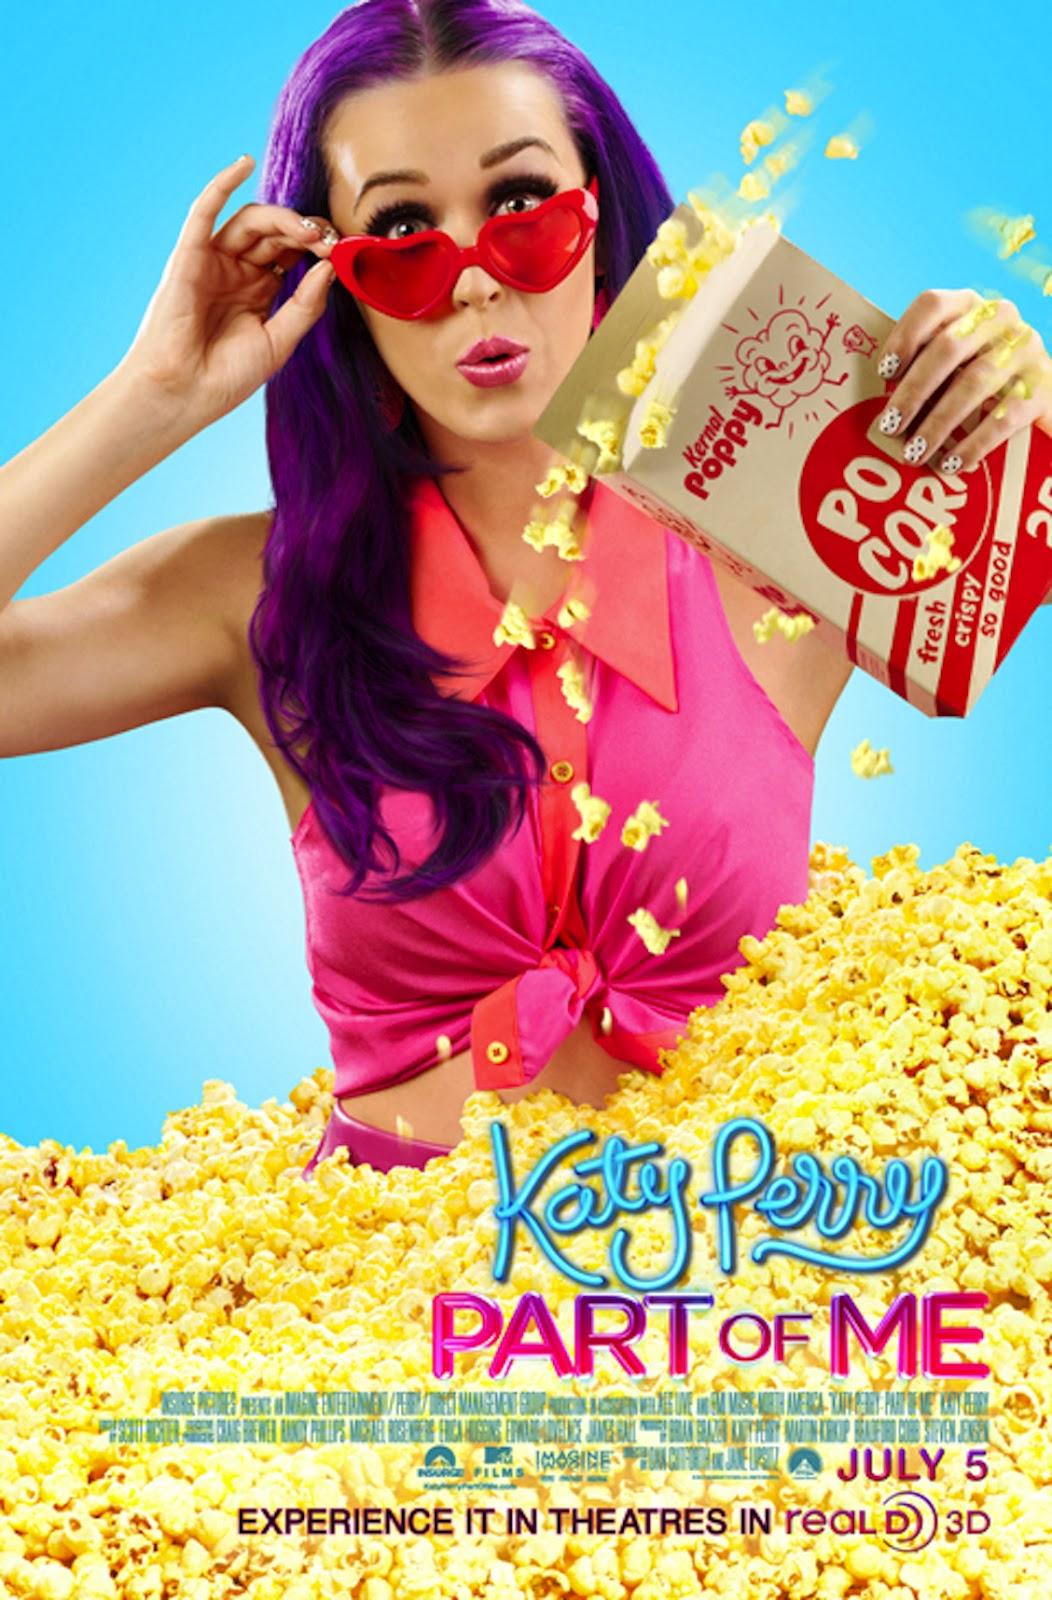 http://4.bp.blogspot.com/-CSupduXVAqA/UC7Sj_t7vxI/AAAAAAAABOY/q8y20JT2IF4/s1600/Katy+Perry+Part+of+Me+Pop+Corn+Poster.jpg